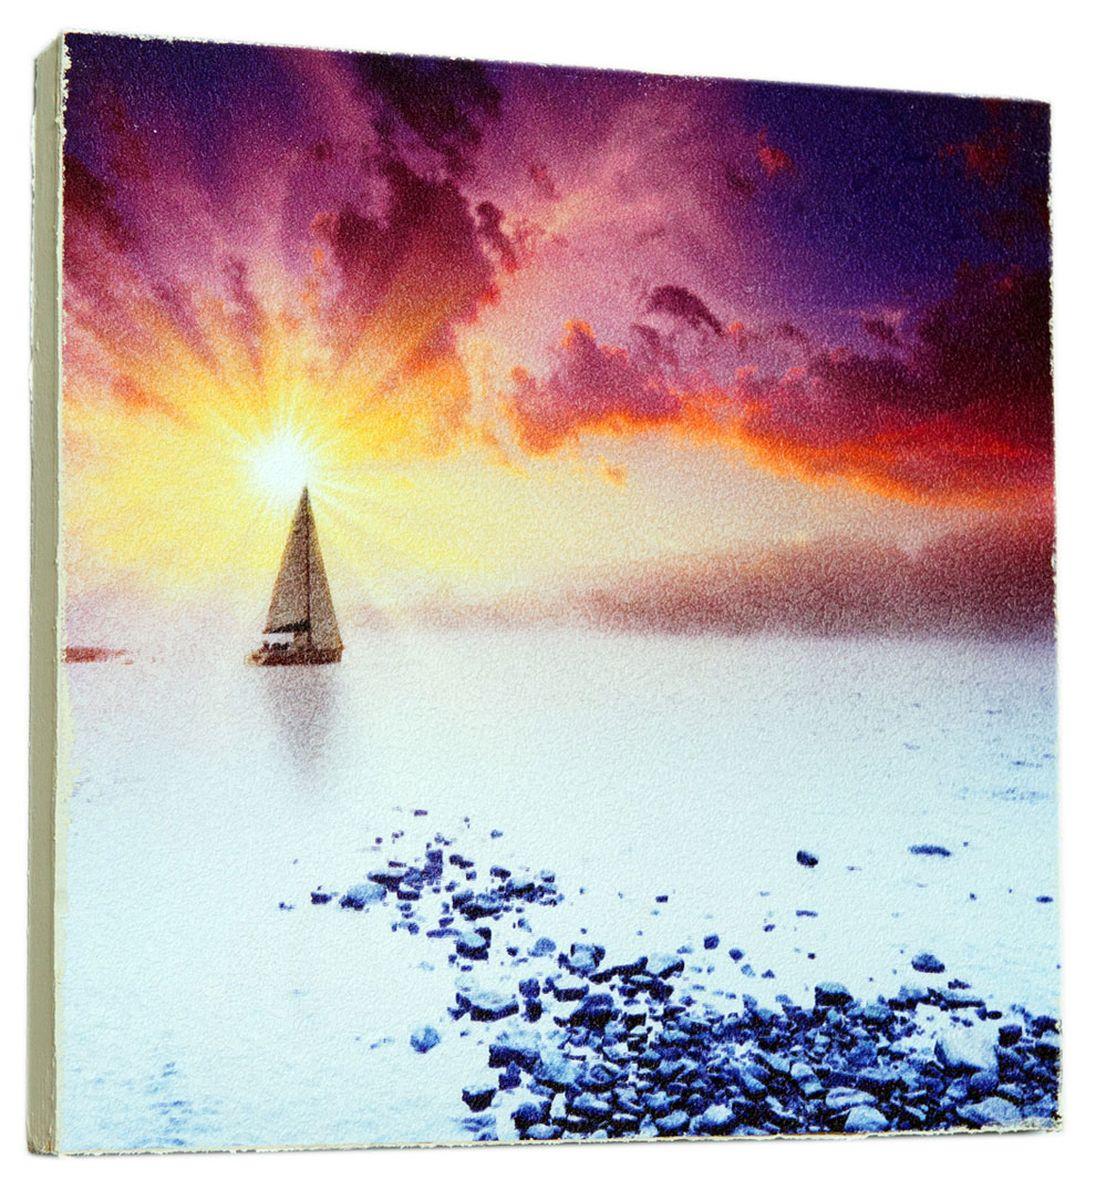 Картина Волшебная яхта на закате, 14,5 х 14,5 см0157-15-15